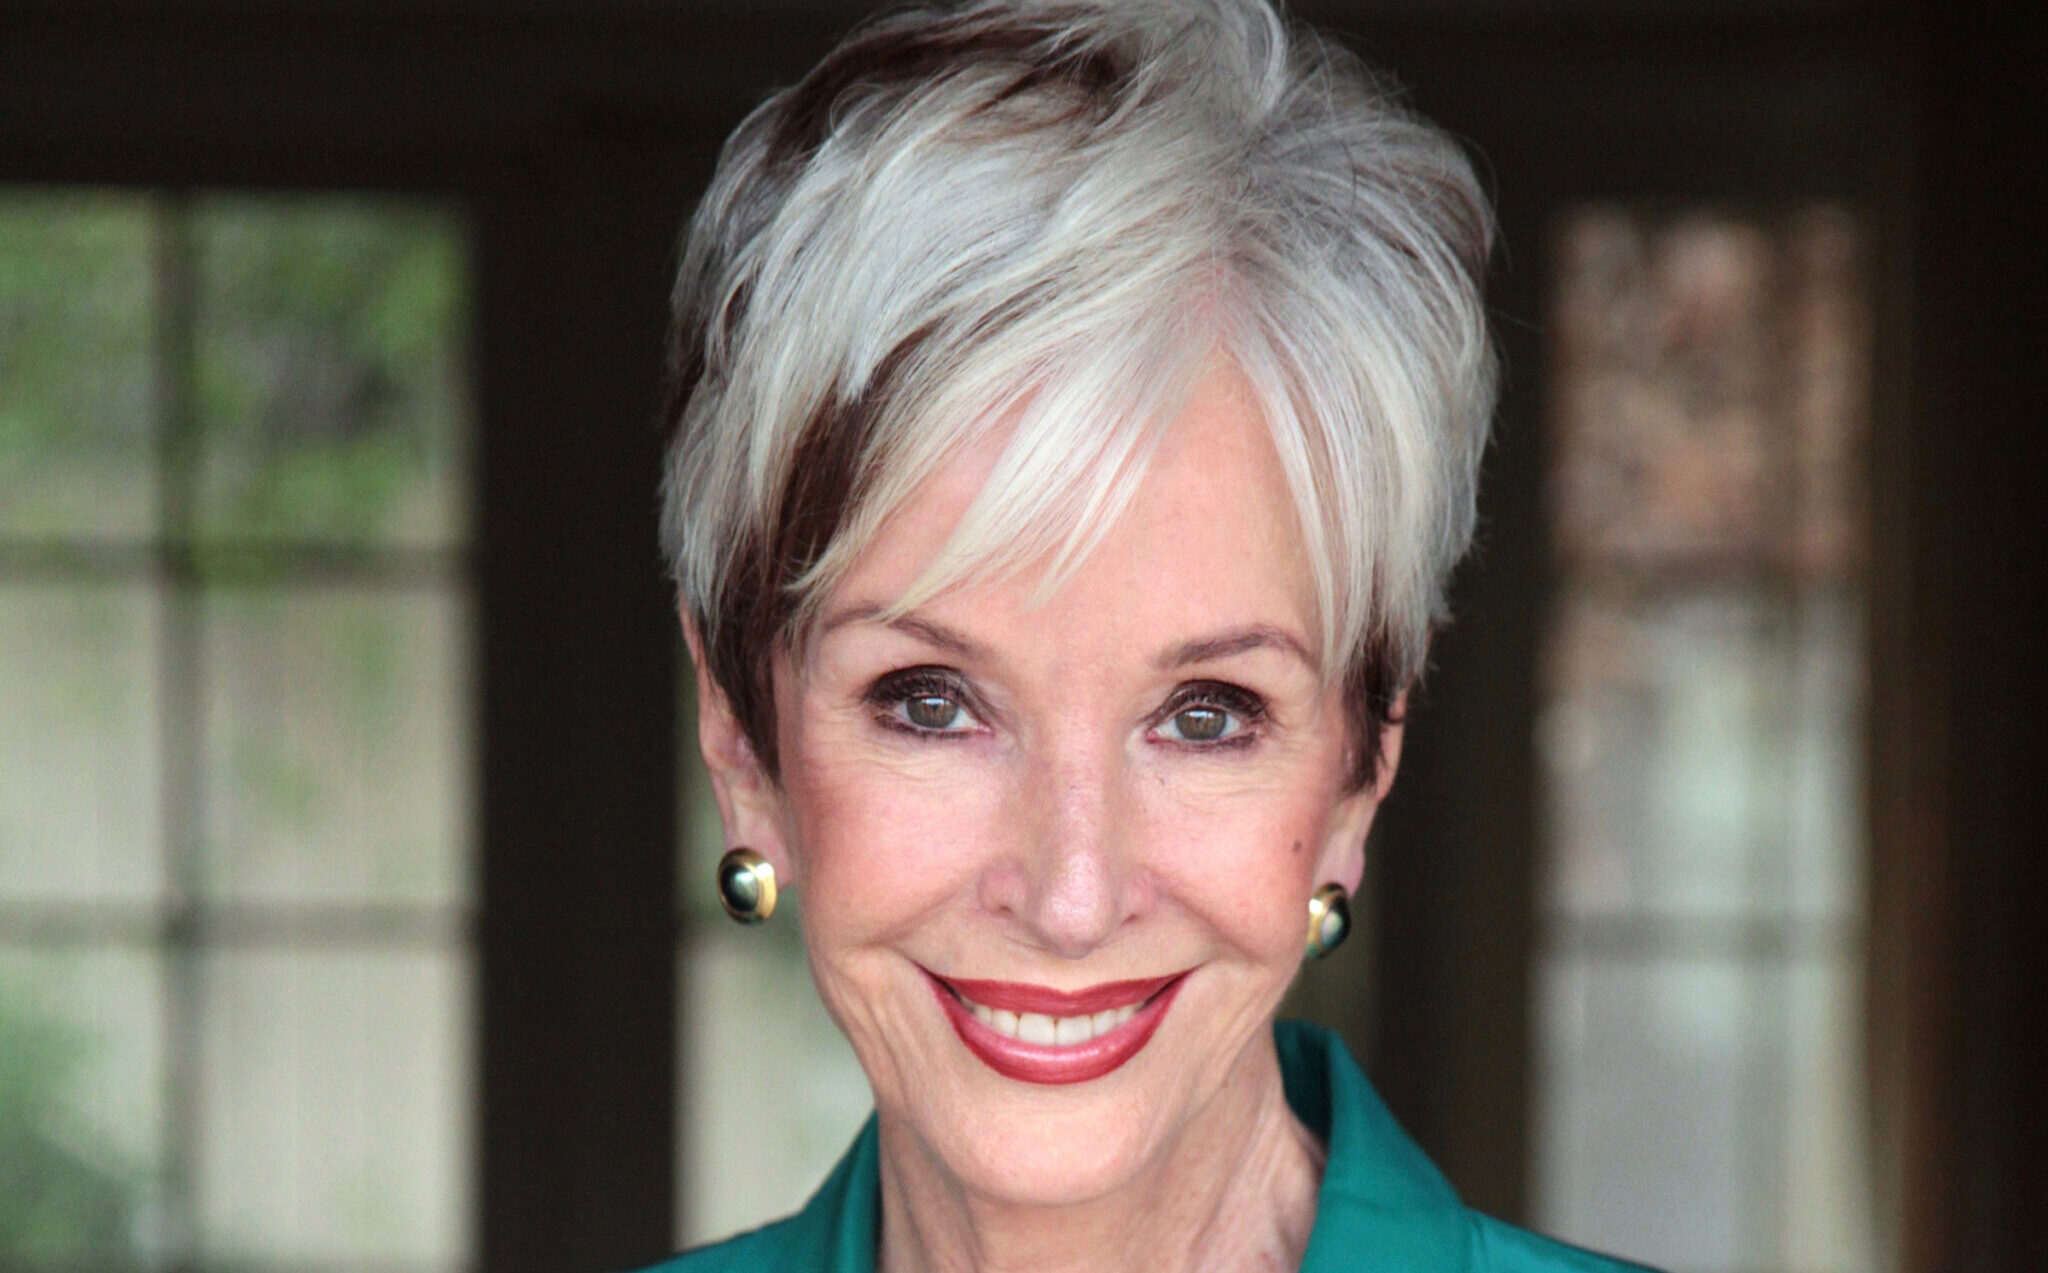 Diana von Welanetz Wentworth: Philanthropy and Giving Back to Society